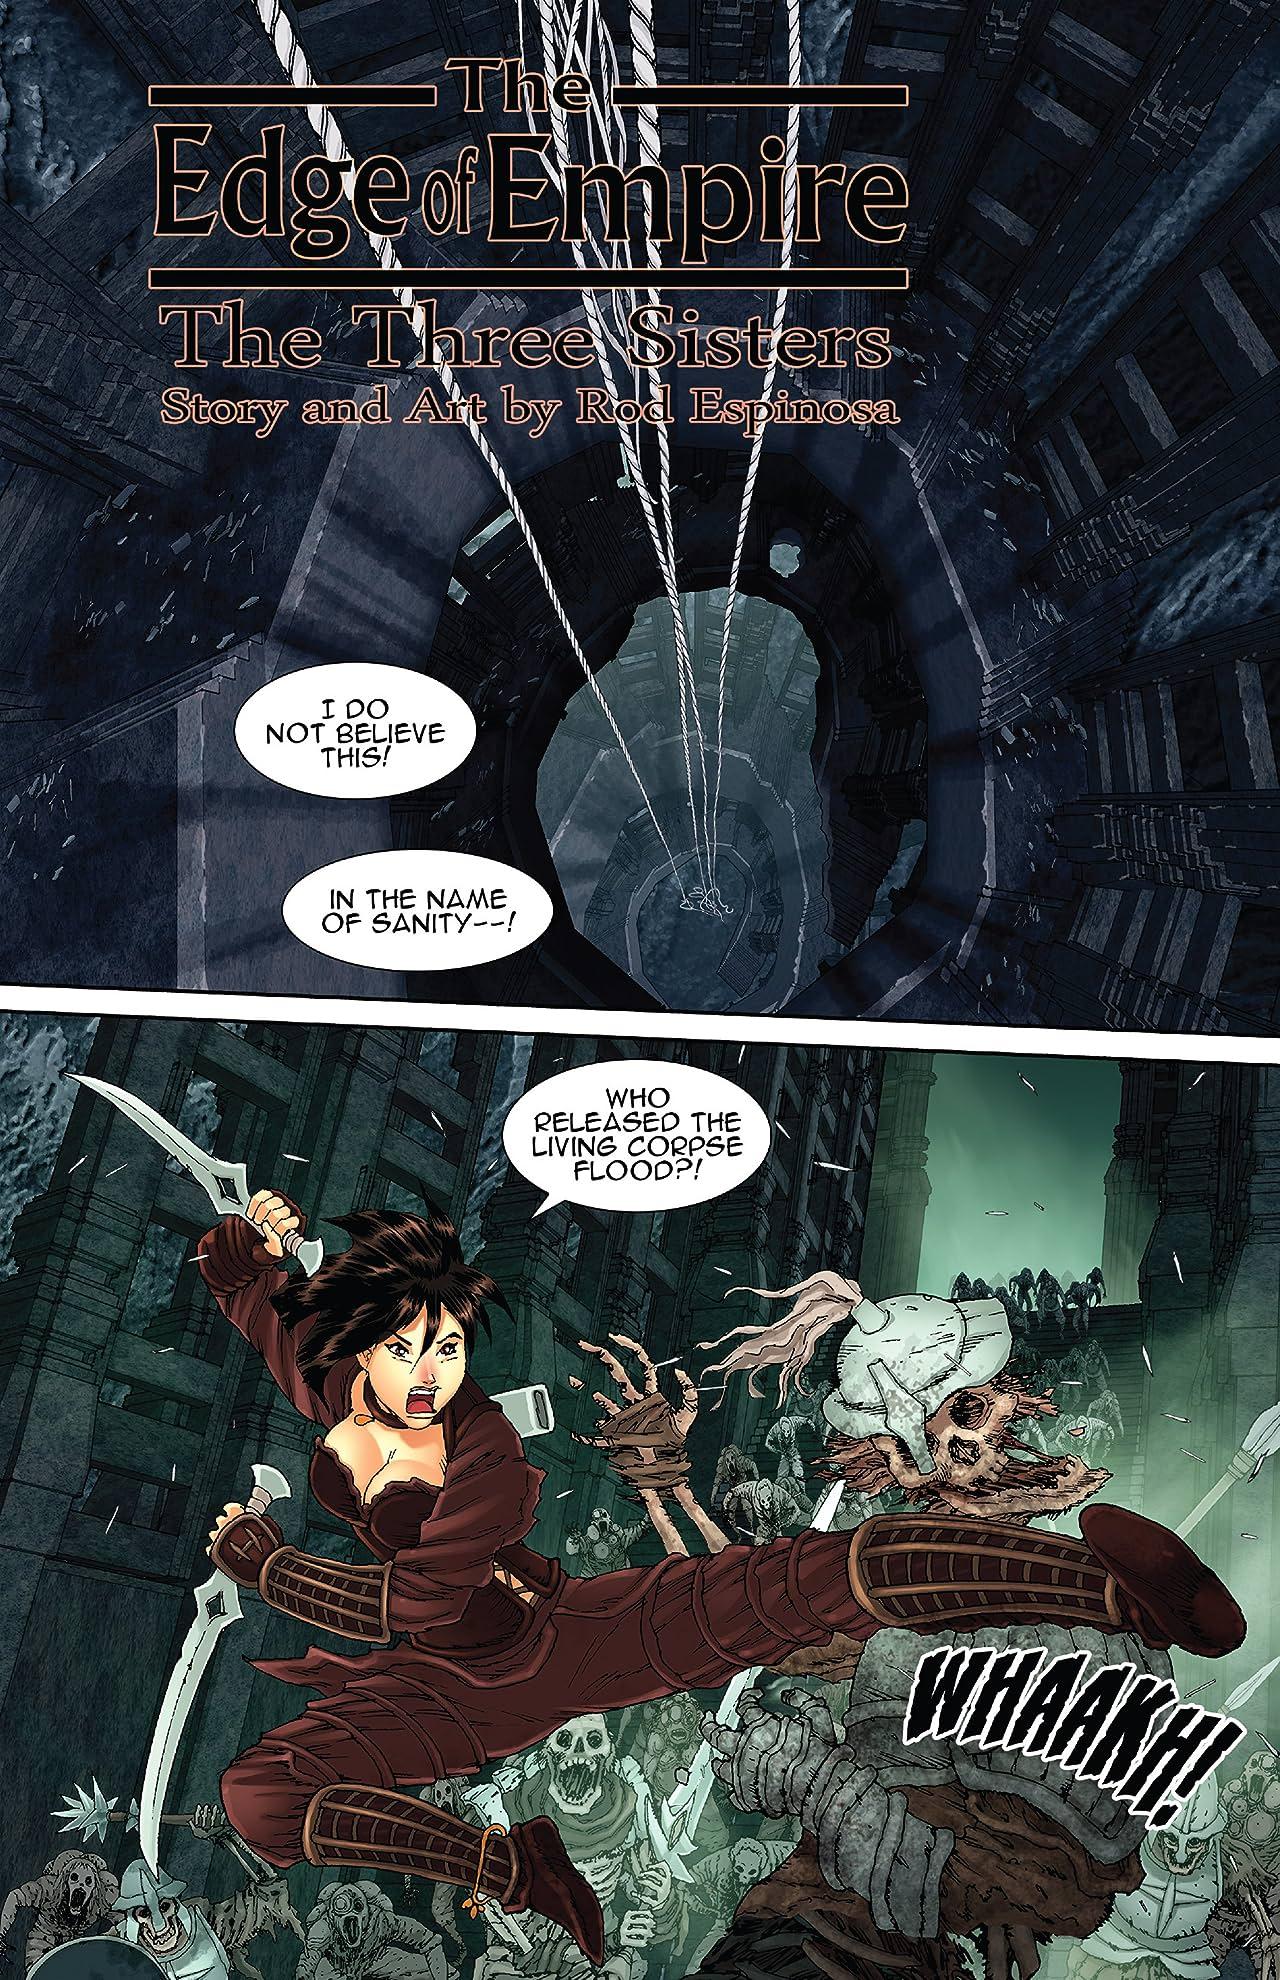 Edge of Empire #1 (of 2)